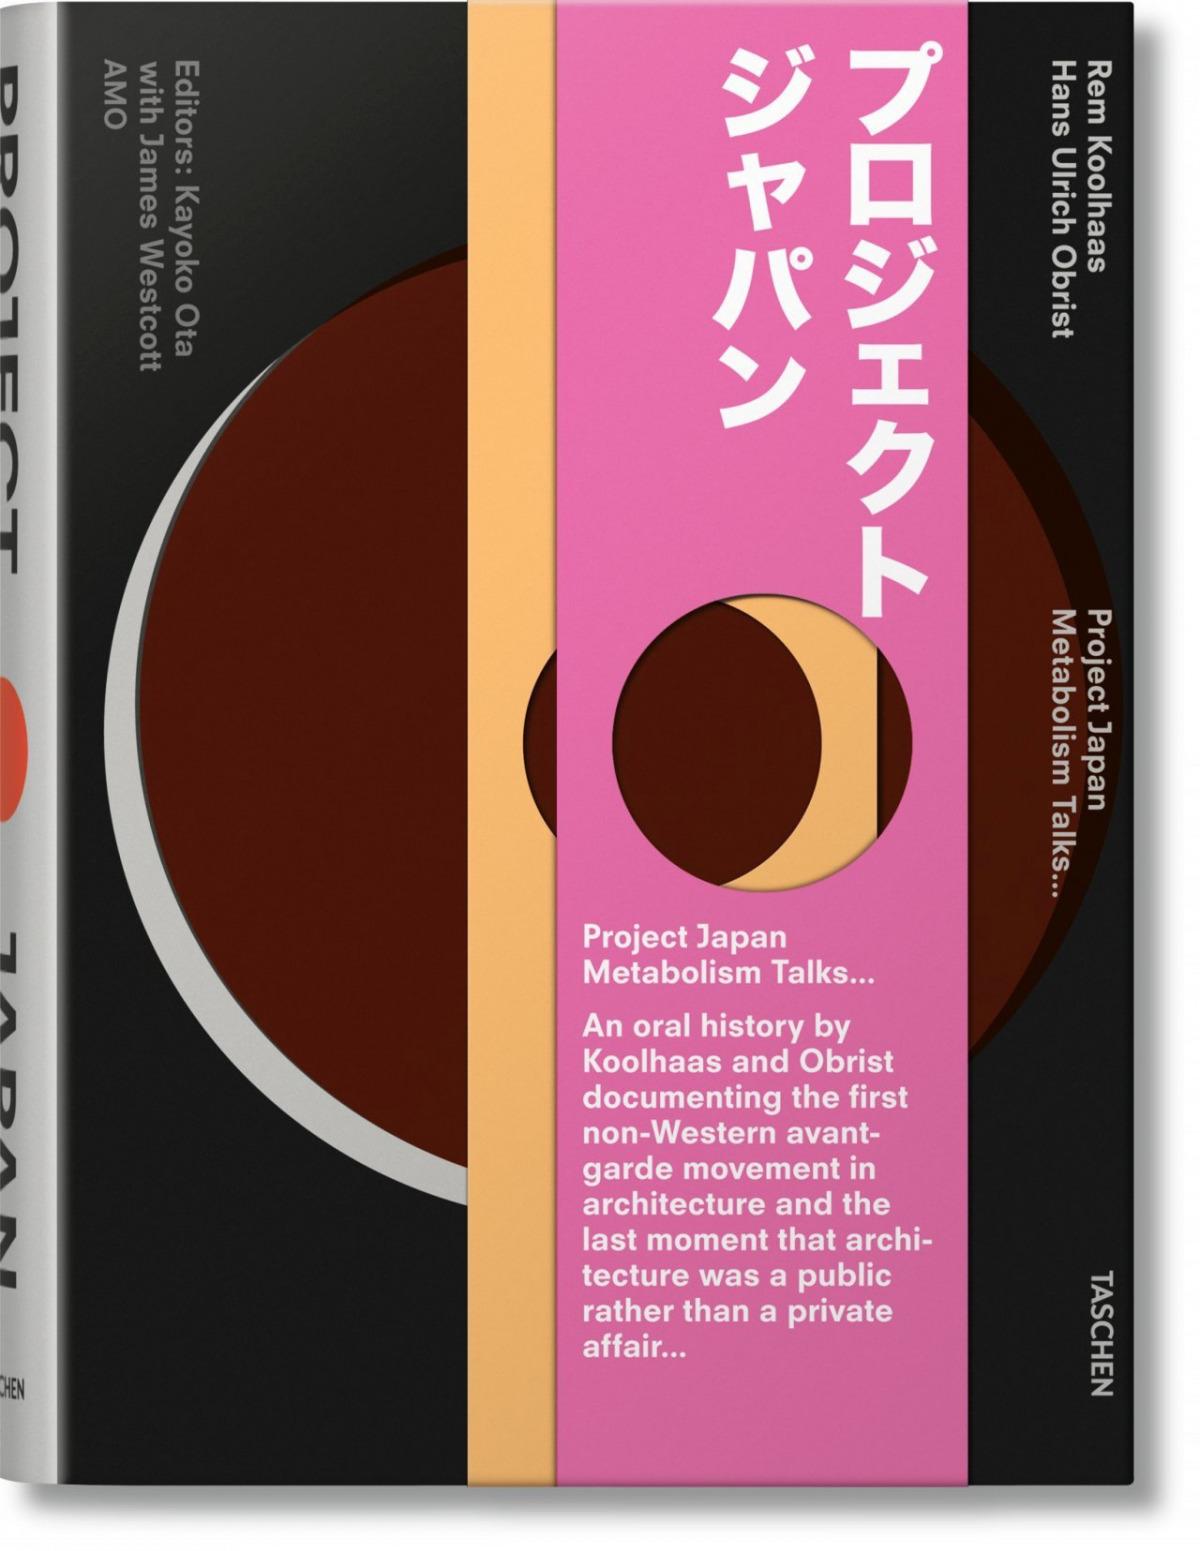 Koolhaas, Project Japan